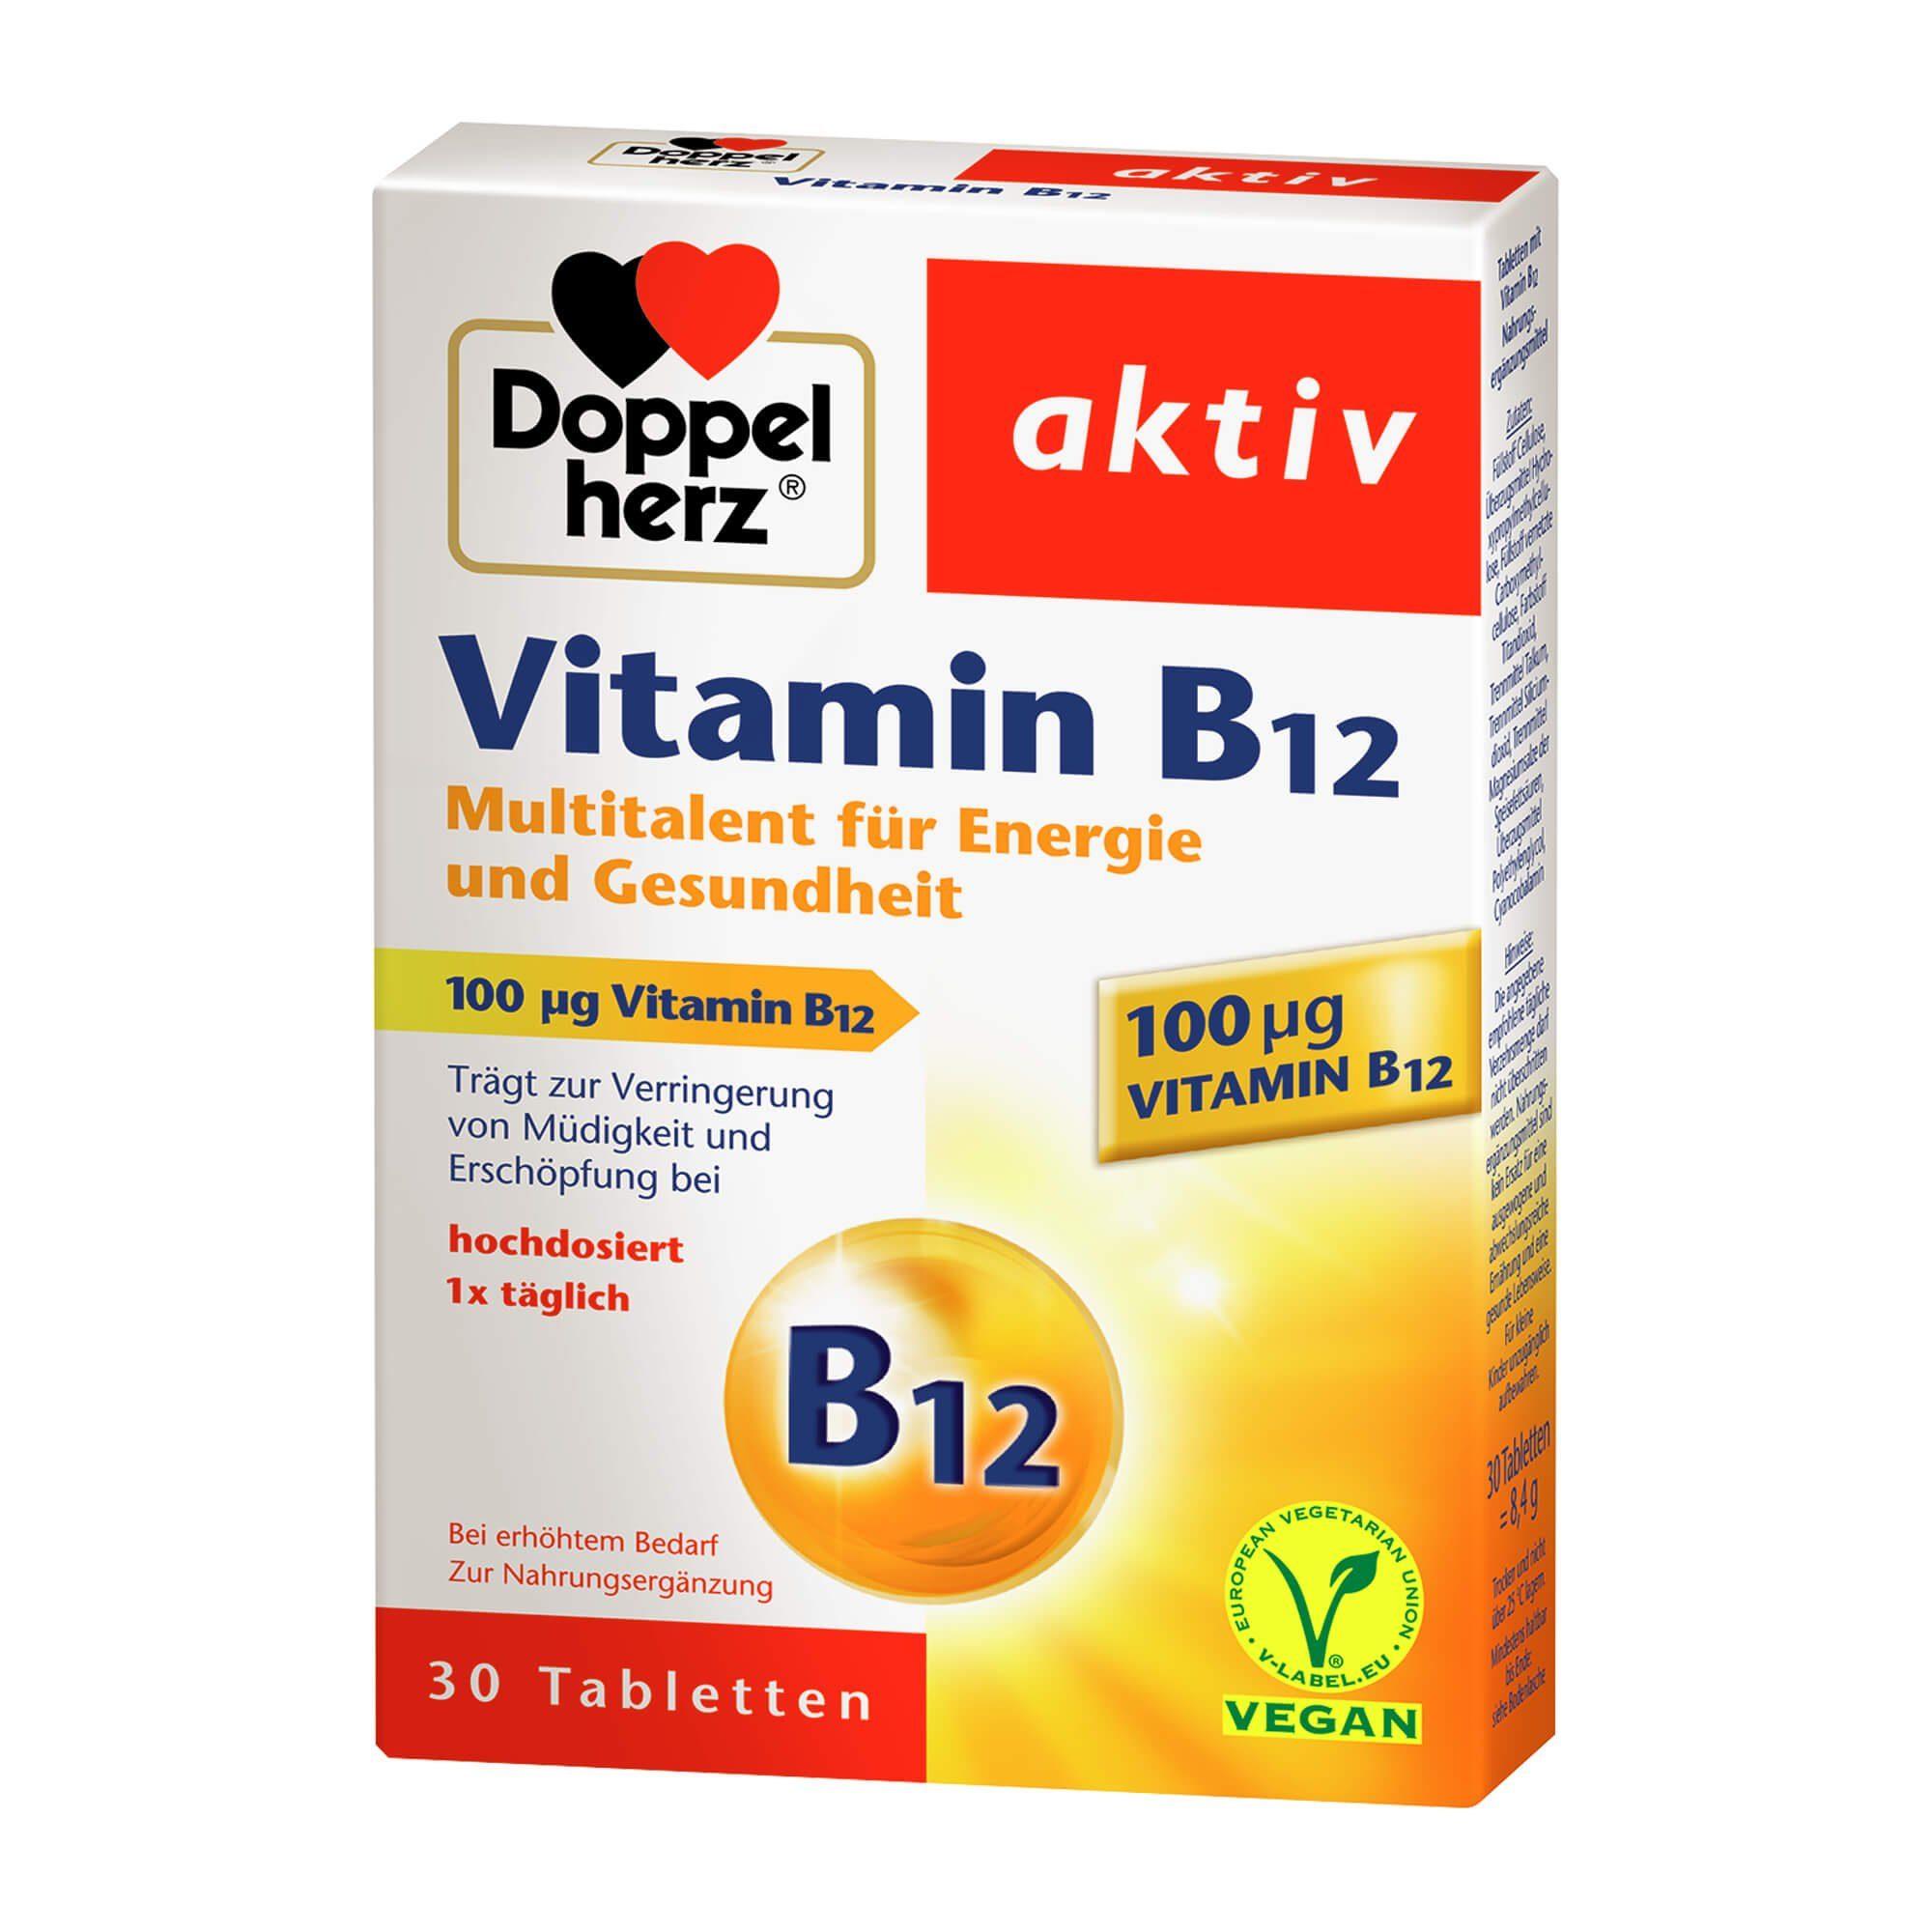 Doppelherz aktiv Vitamin B12 Tabletten, 30 St